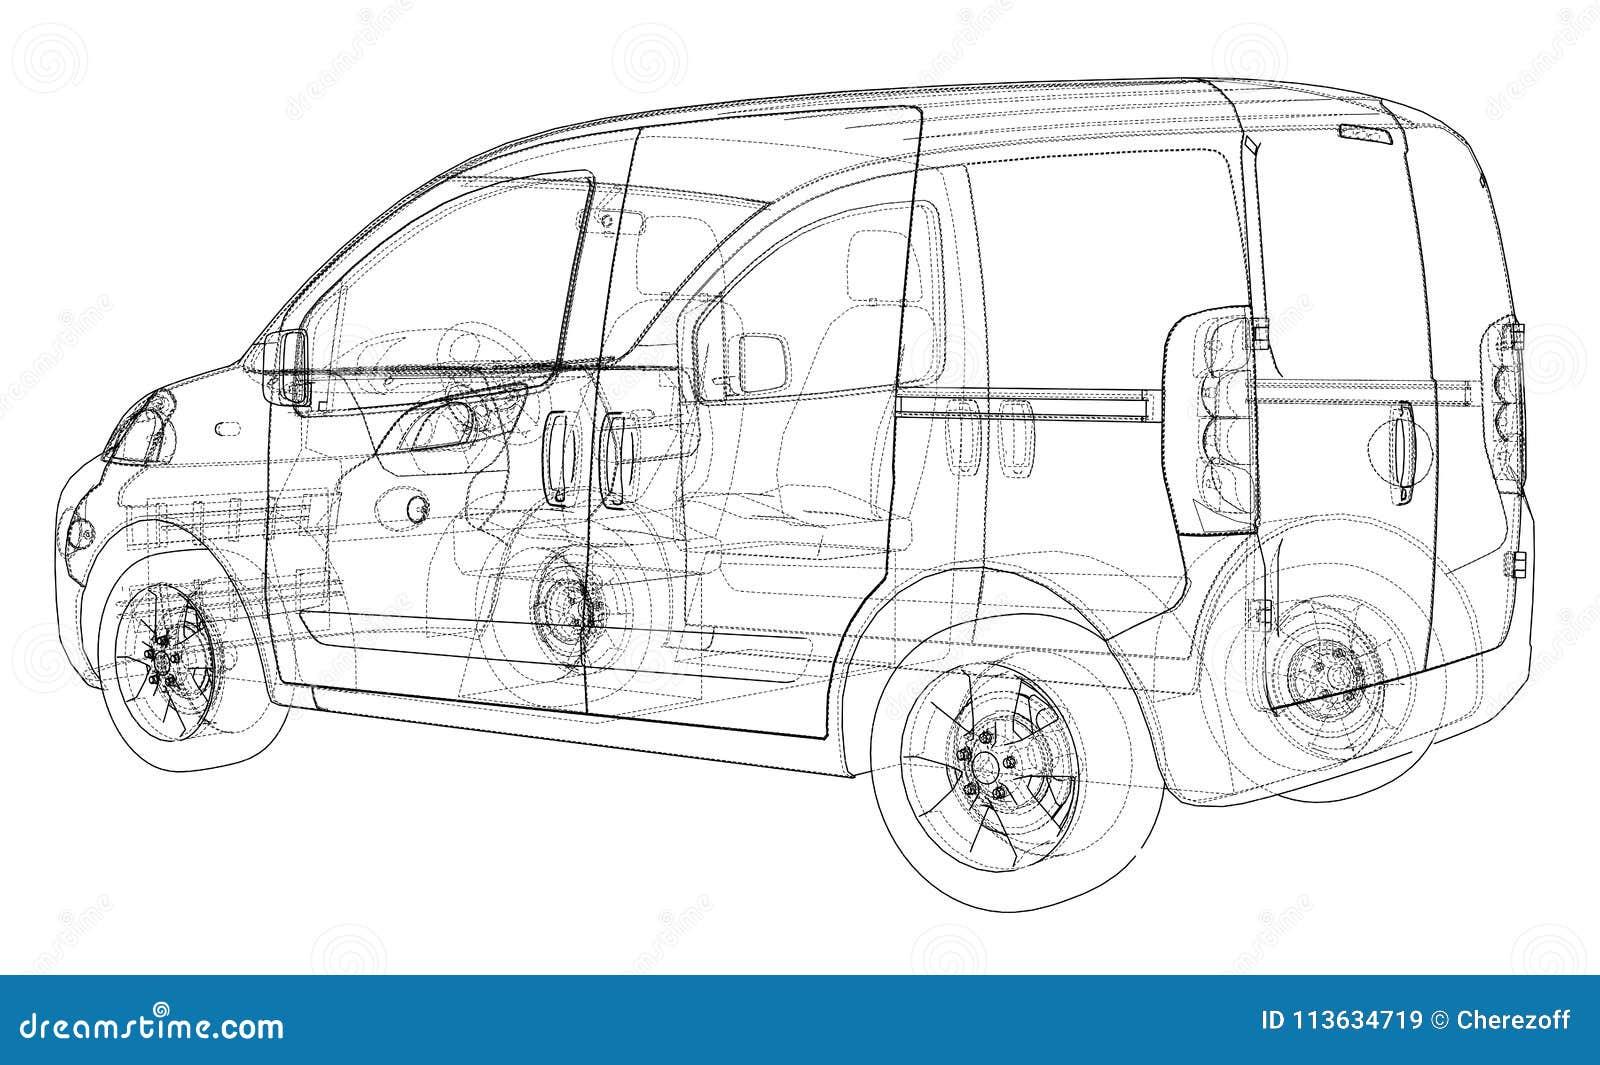 Concept car blueprint stock illustration. Illustration of auto ...